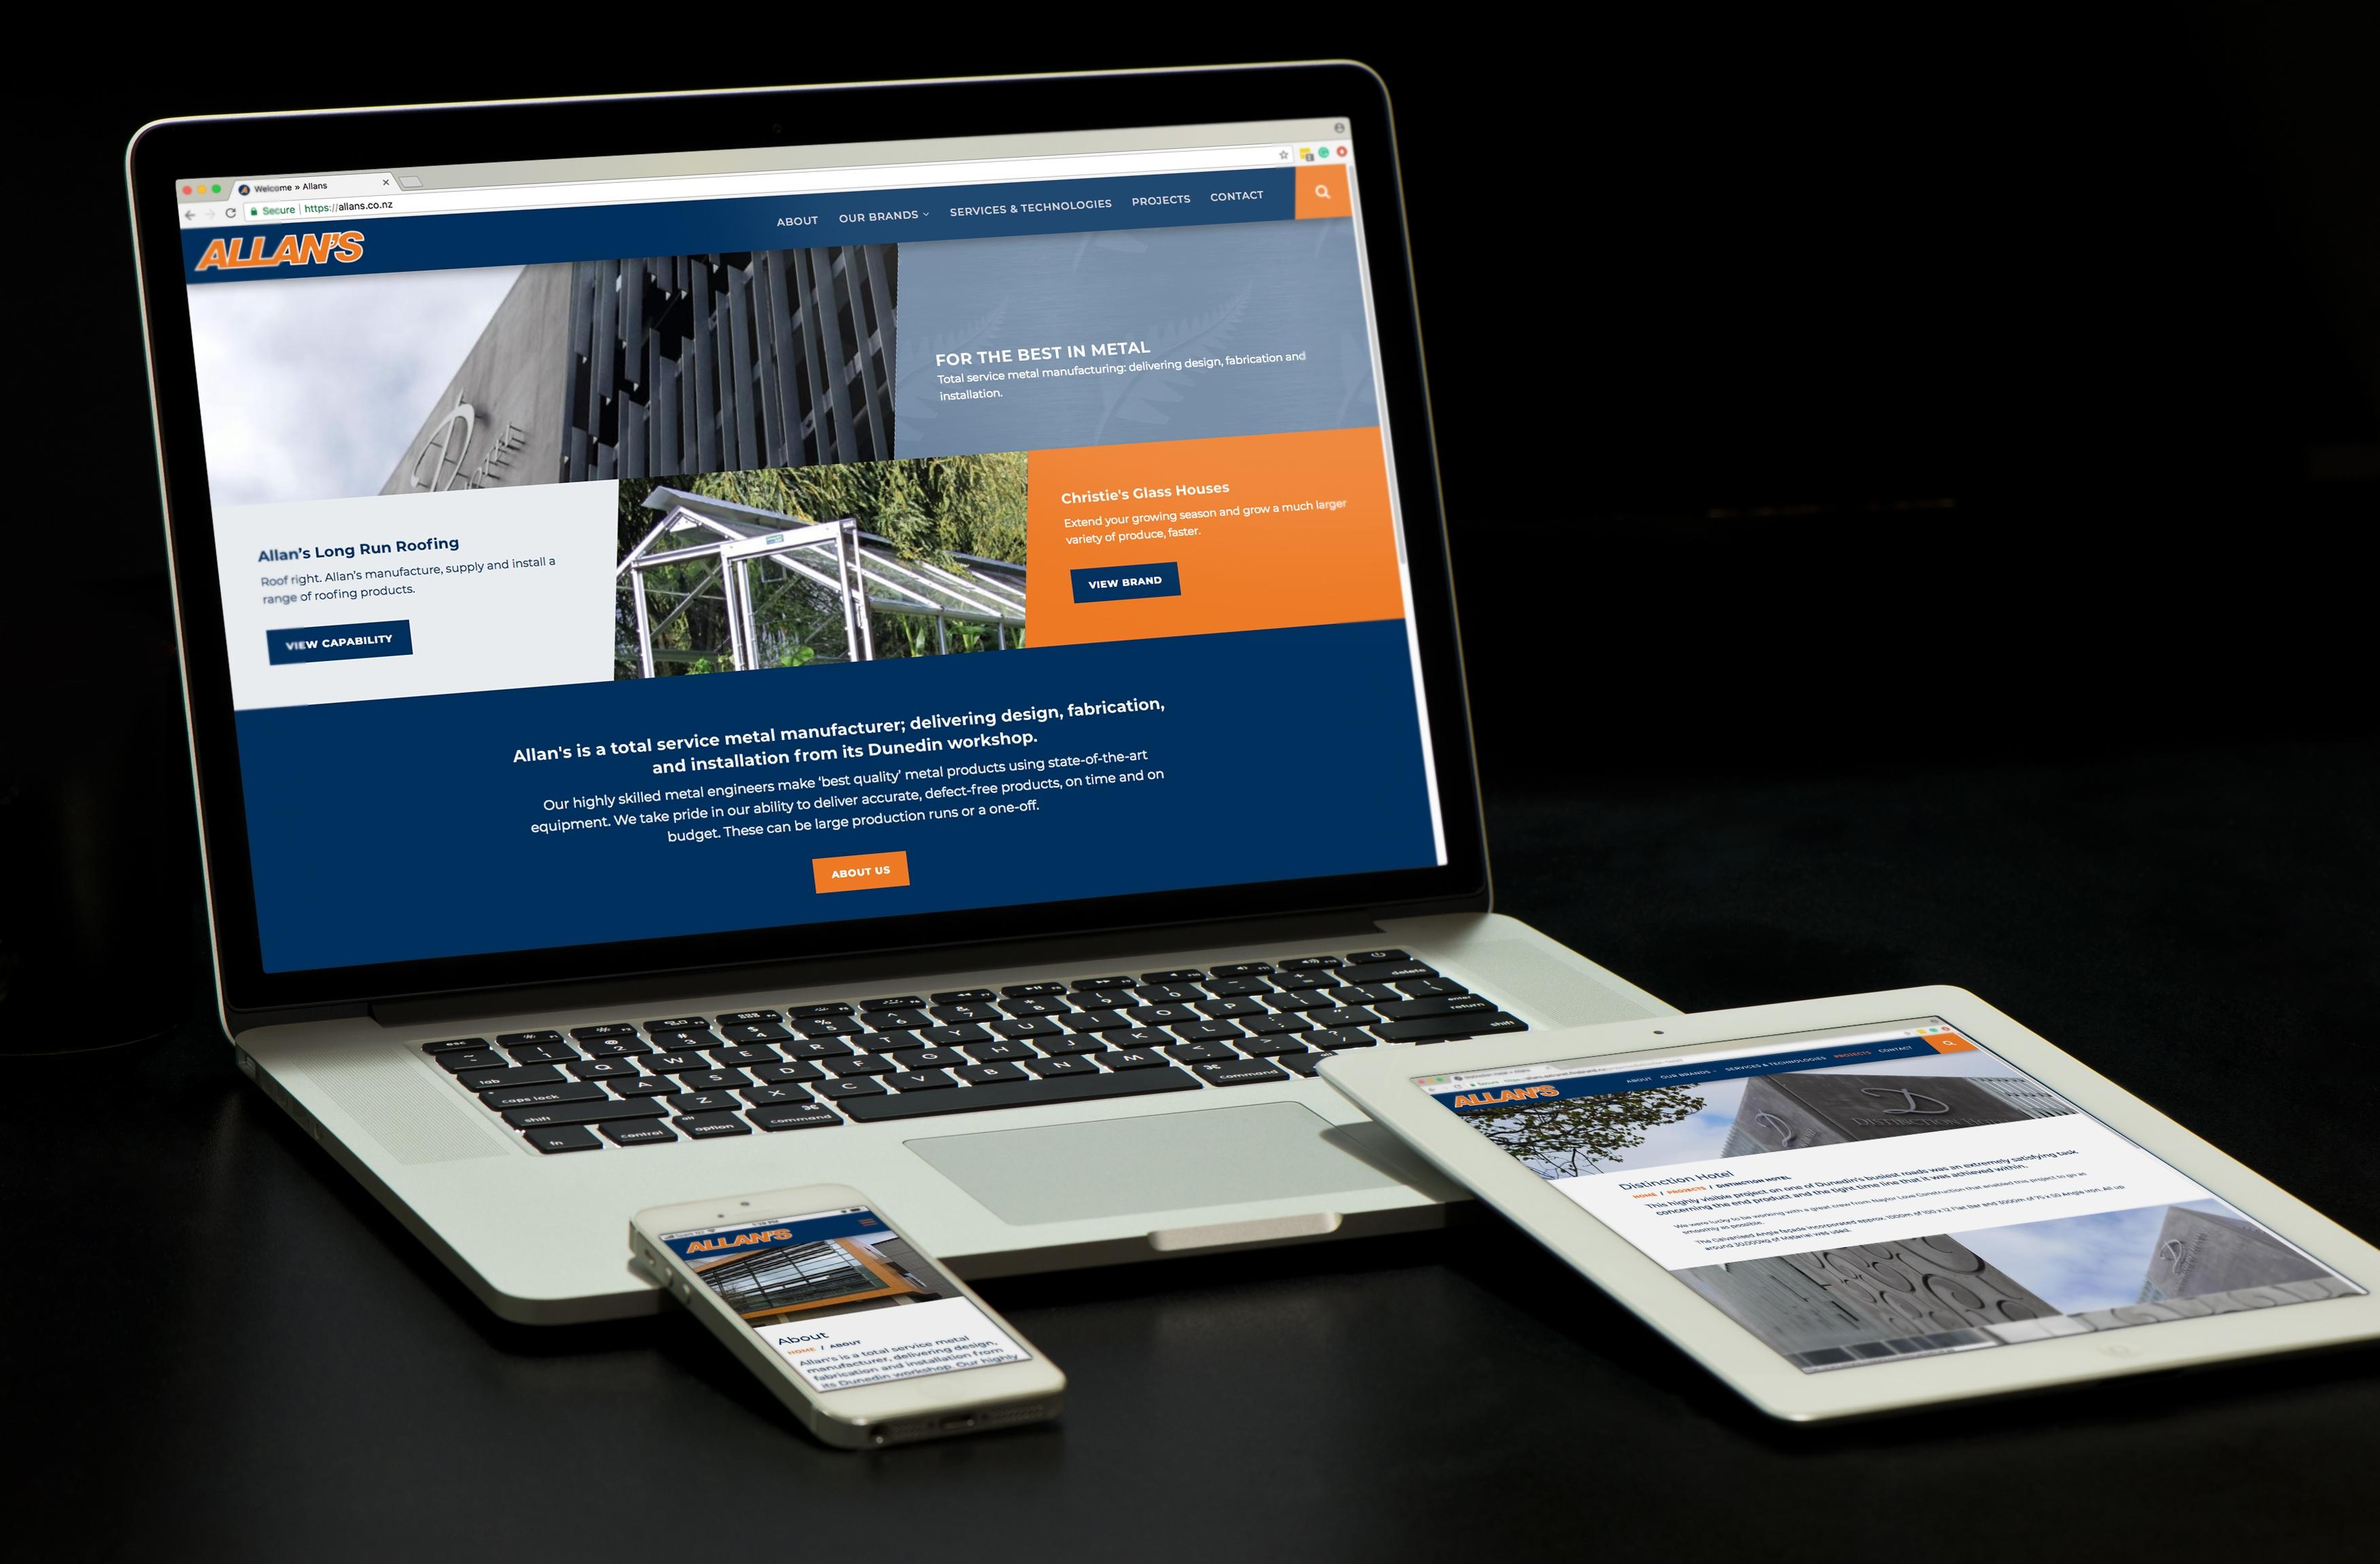 Allans website